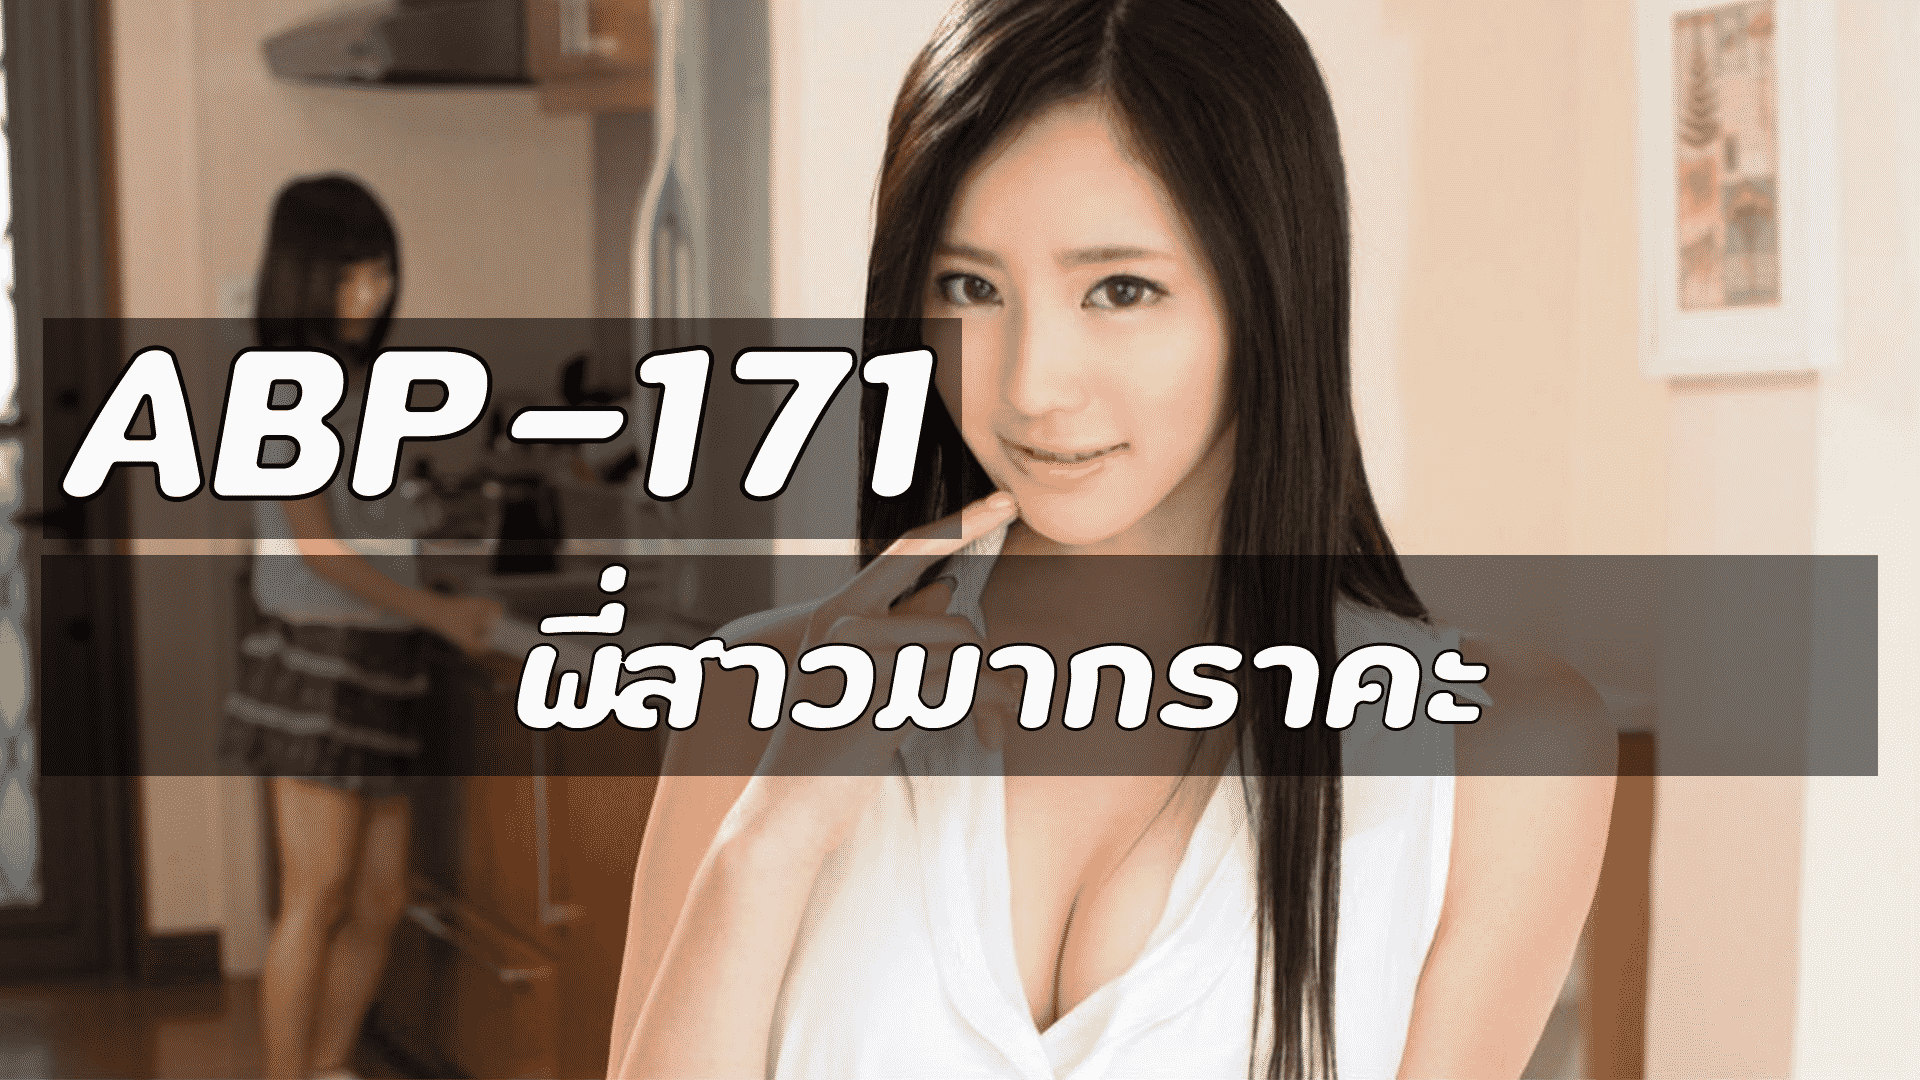 ABP-171 เมื่อแฟนของน้องสาวถูกใจพี่สาวสุดแรดกับเรื่องราว